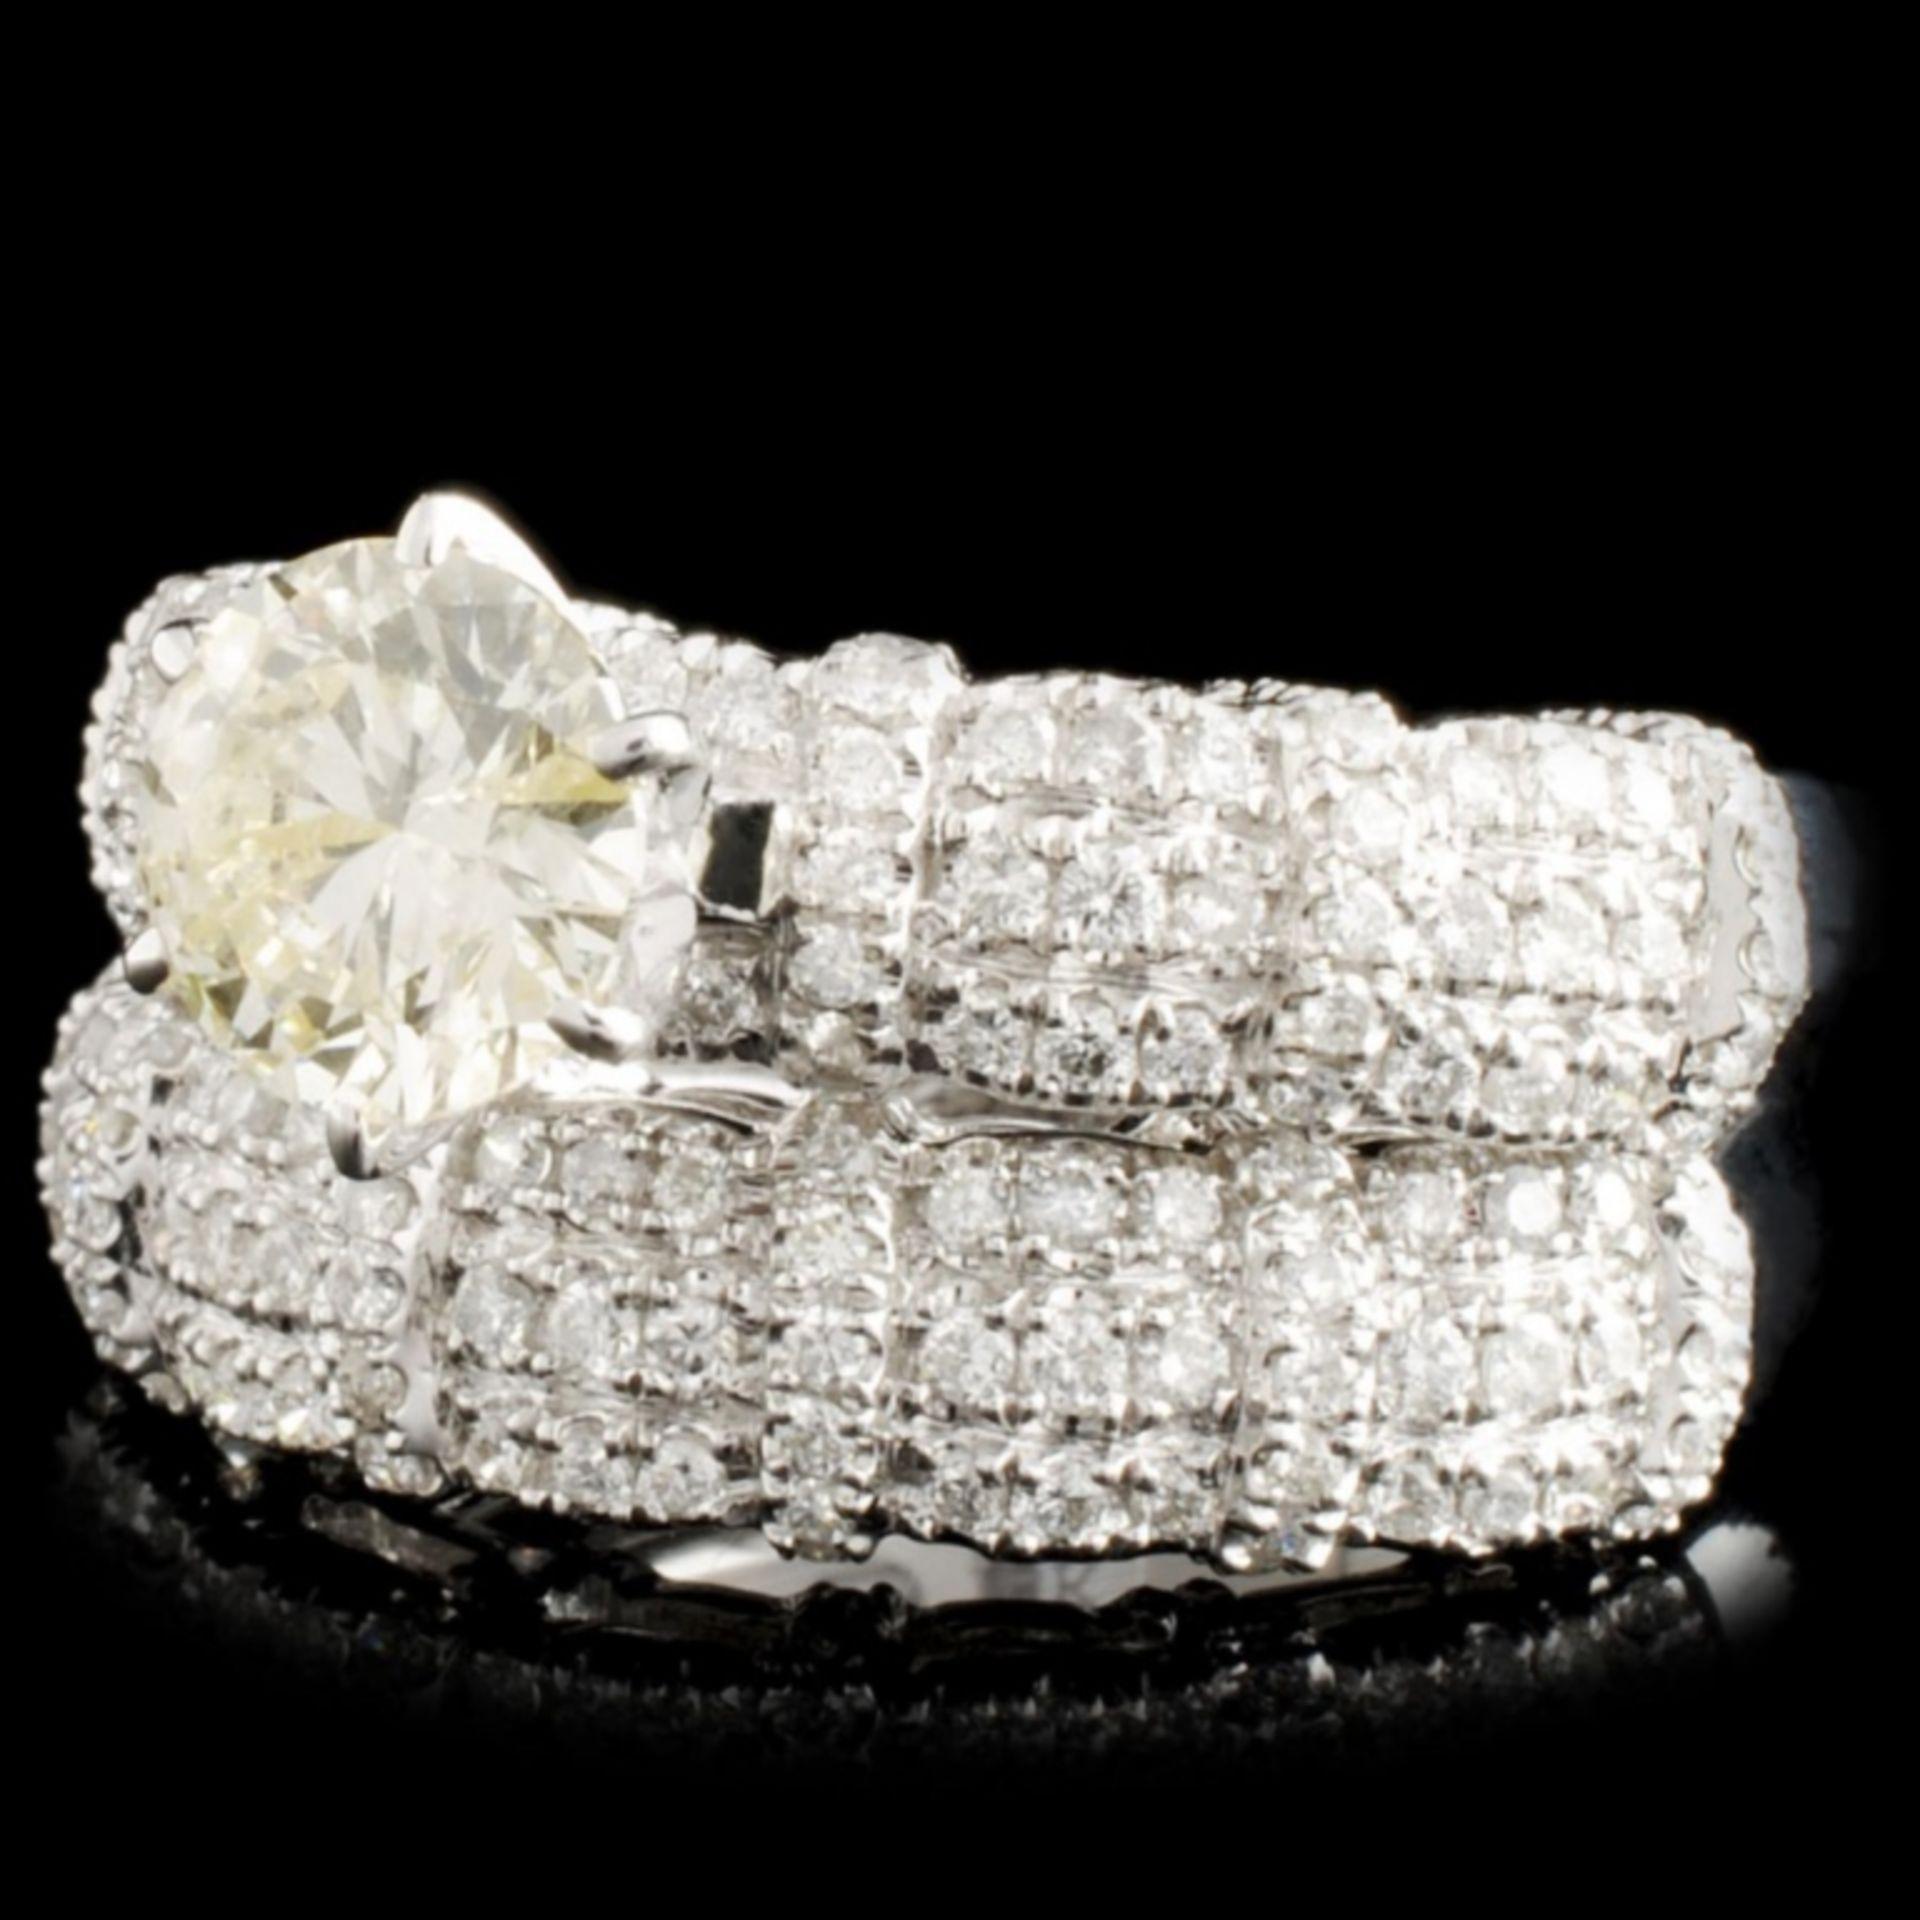 18K Gold 1.92ctw Diamond Ring - Image 2 of 4